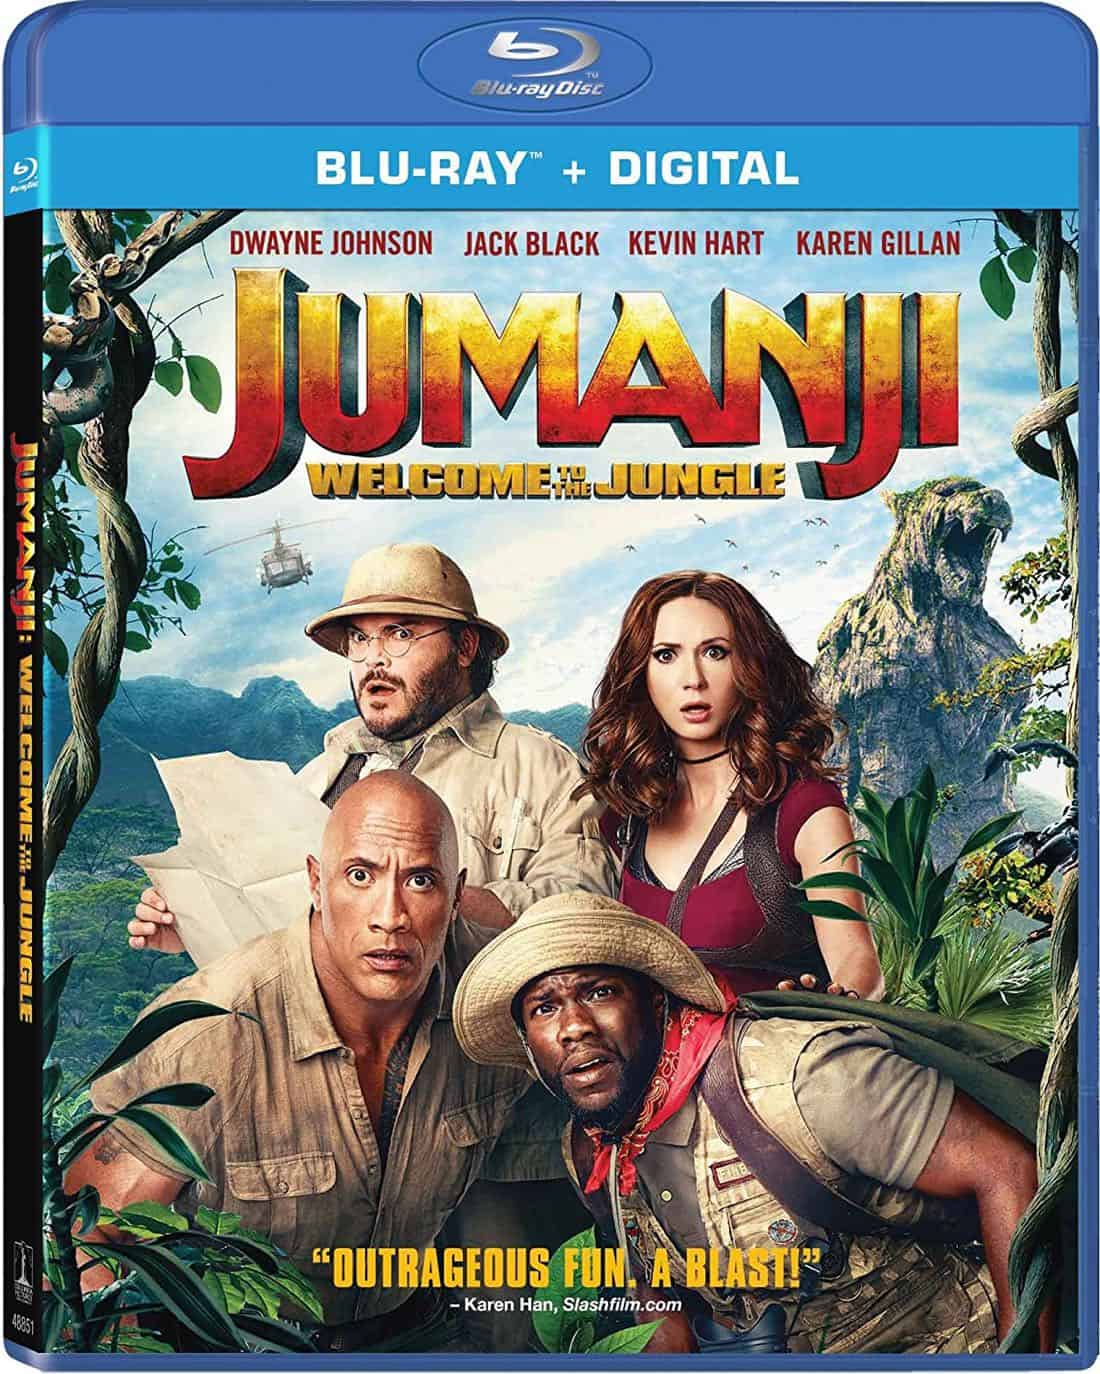 JUMANJI WELCOME TO THE JUNGLE Blu-ray + Digital